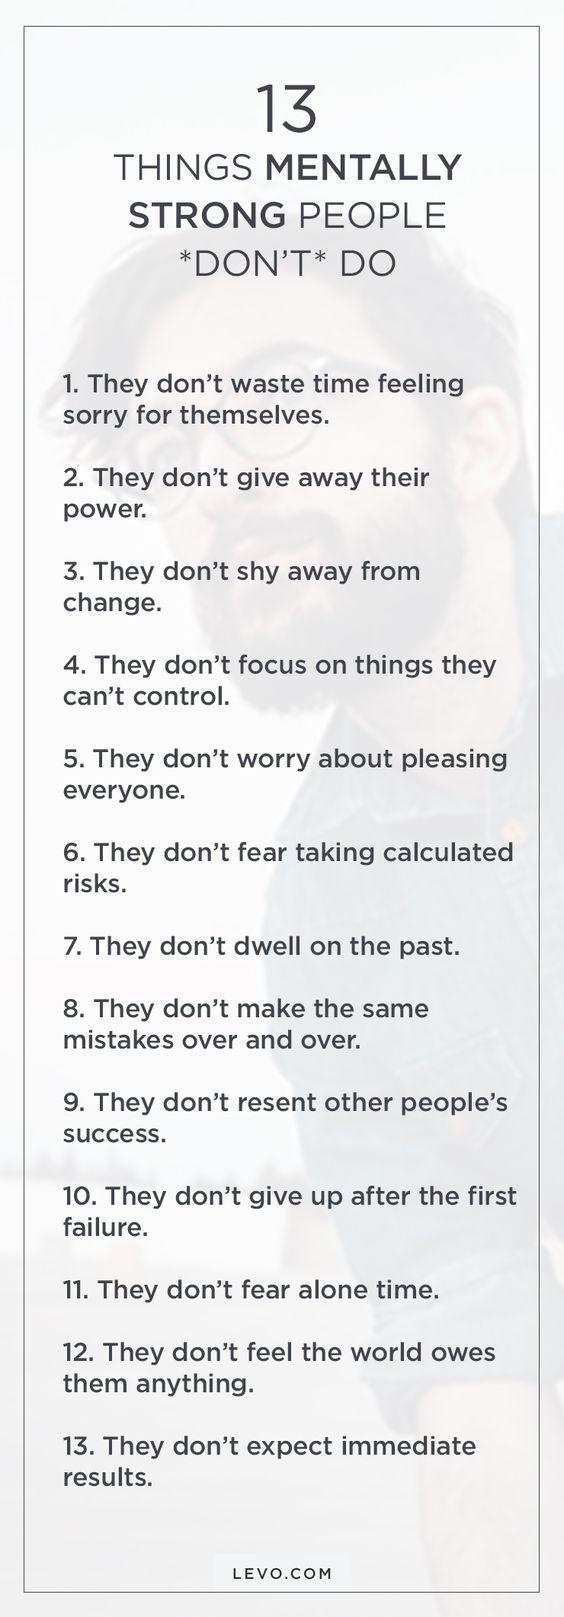 personal development ideas self improvement tips self help activities psychol #PersonalDevelopmentactivities